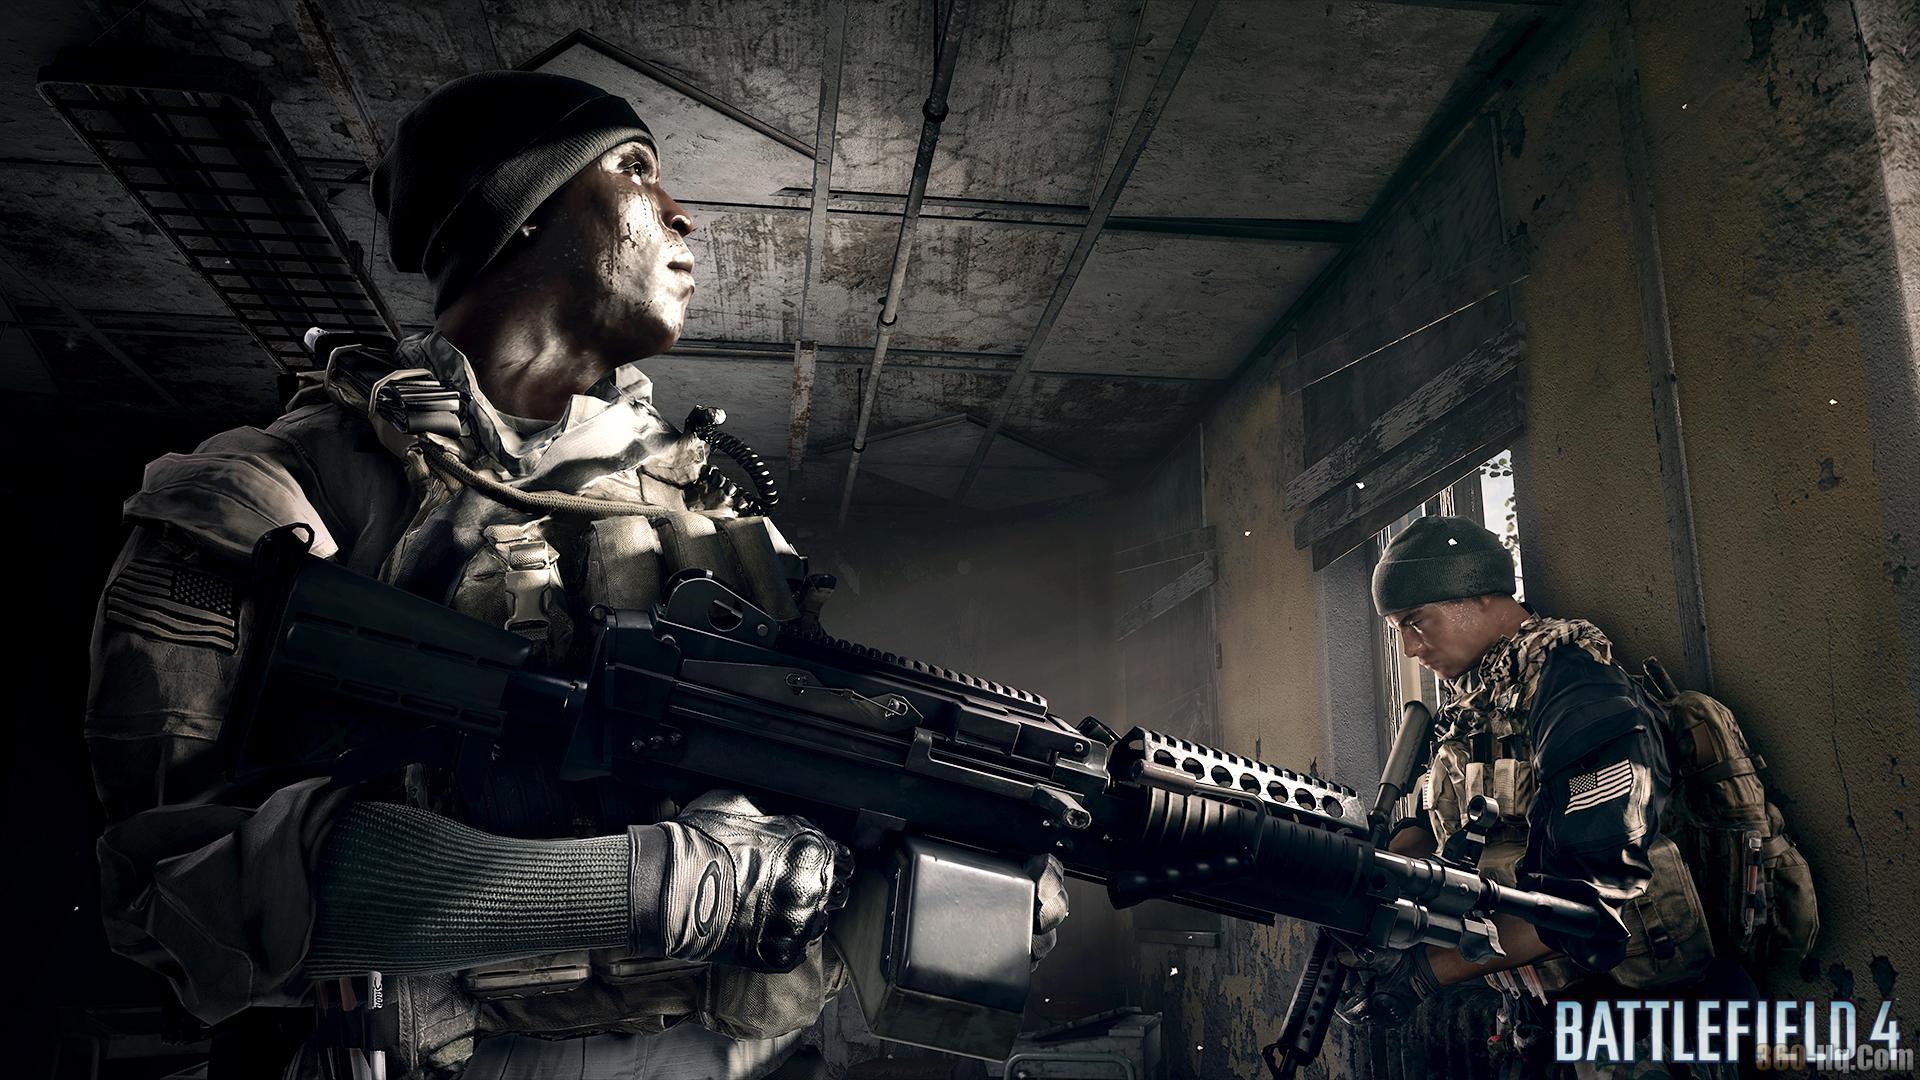 Battlefield 4 Xbox 360 Screenshot 27500